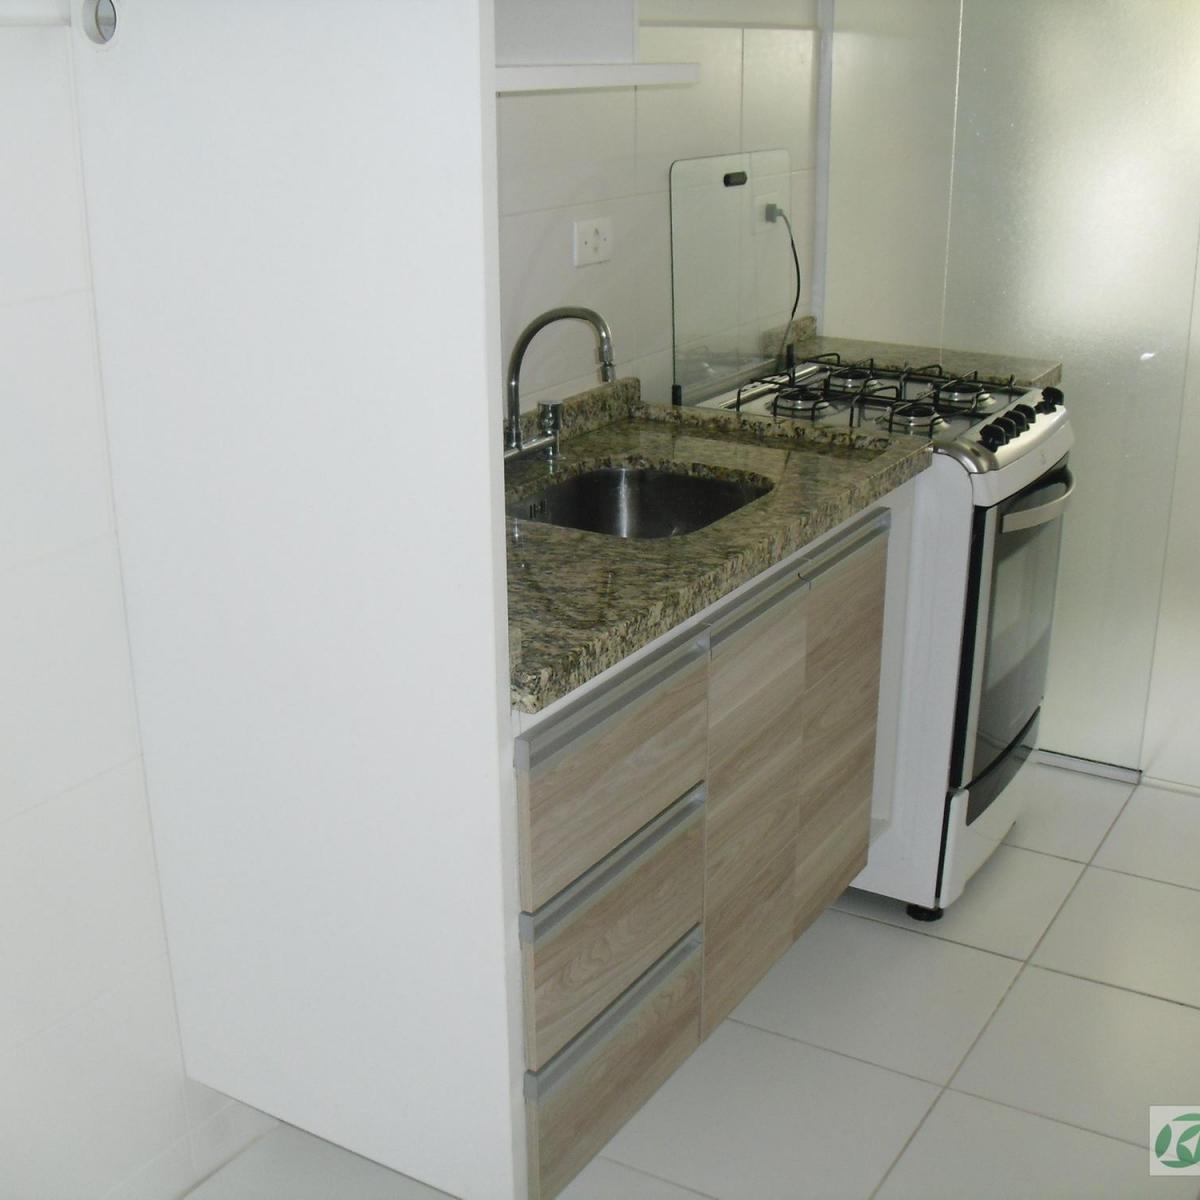 Comprido Curitiba R$ 1.200 6800 m2 ID: 2930503868 Imovelweb #57533D 1200x1200 Balcão Banheiro Curitiba